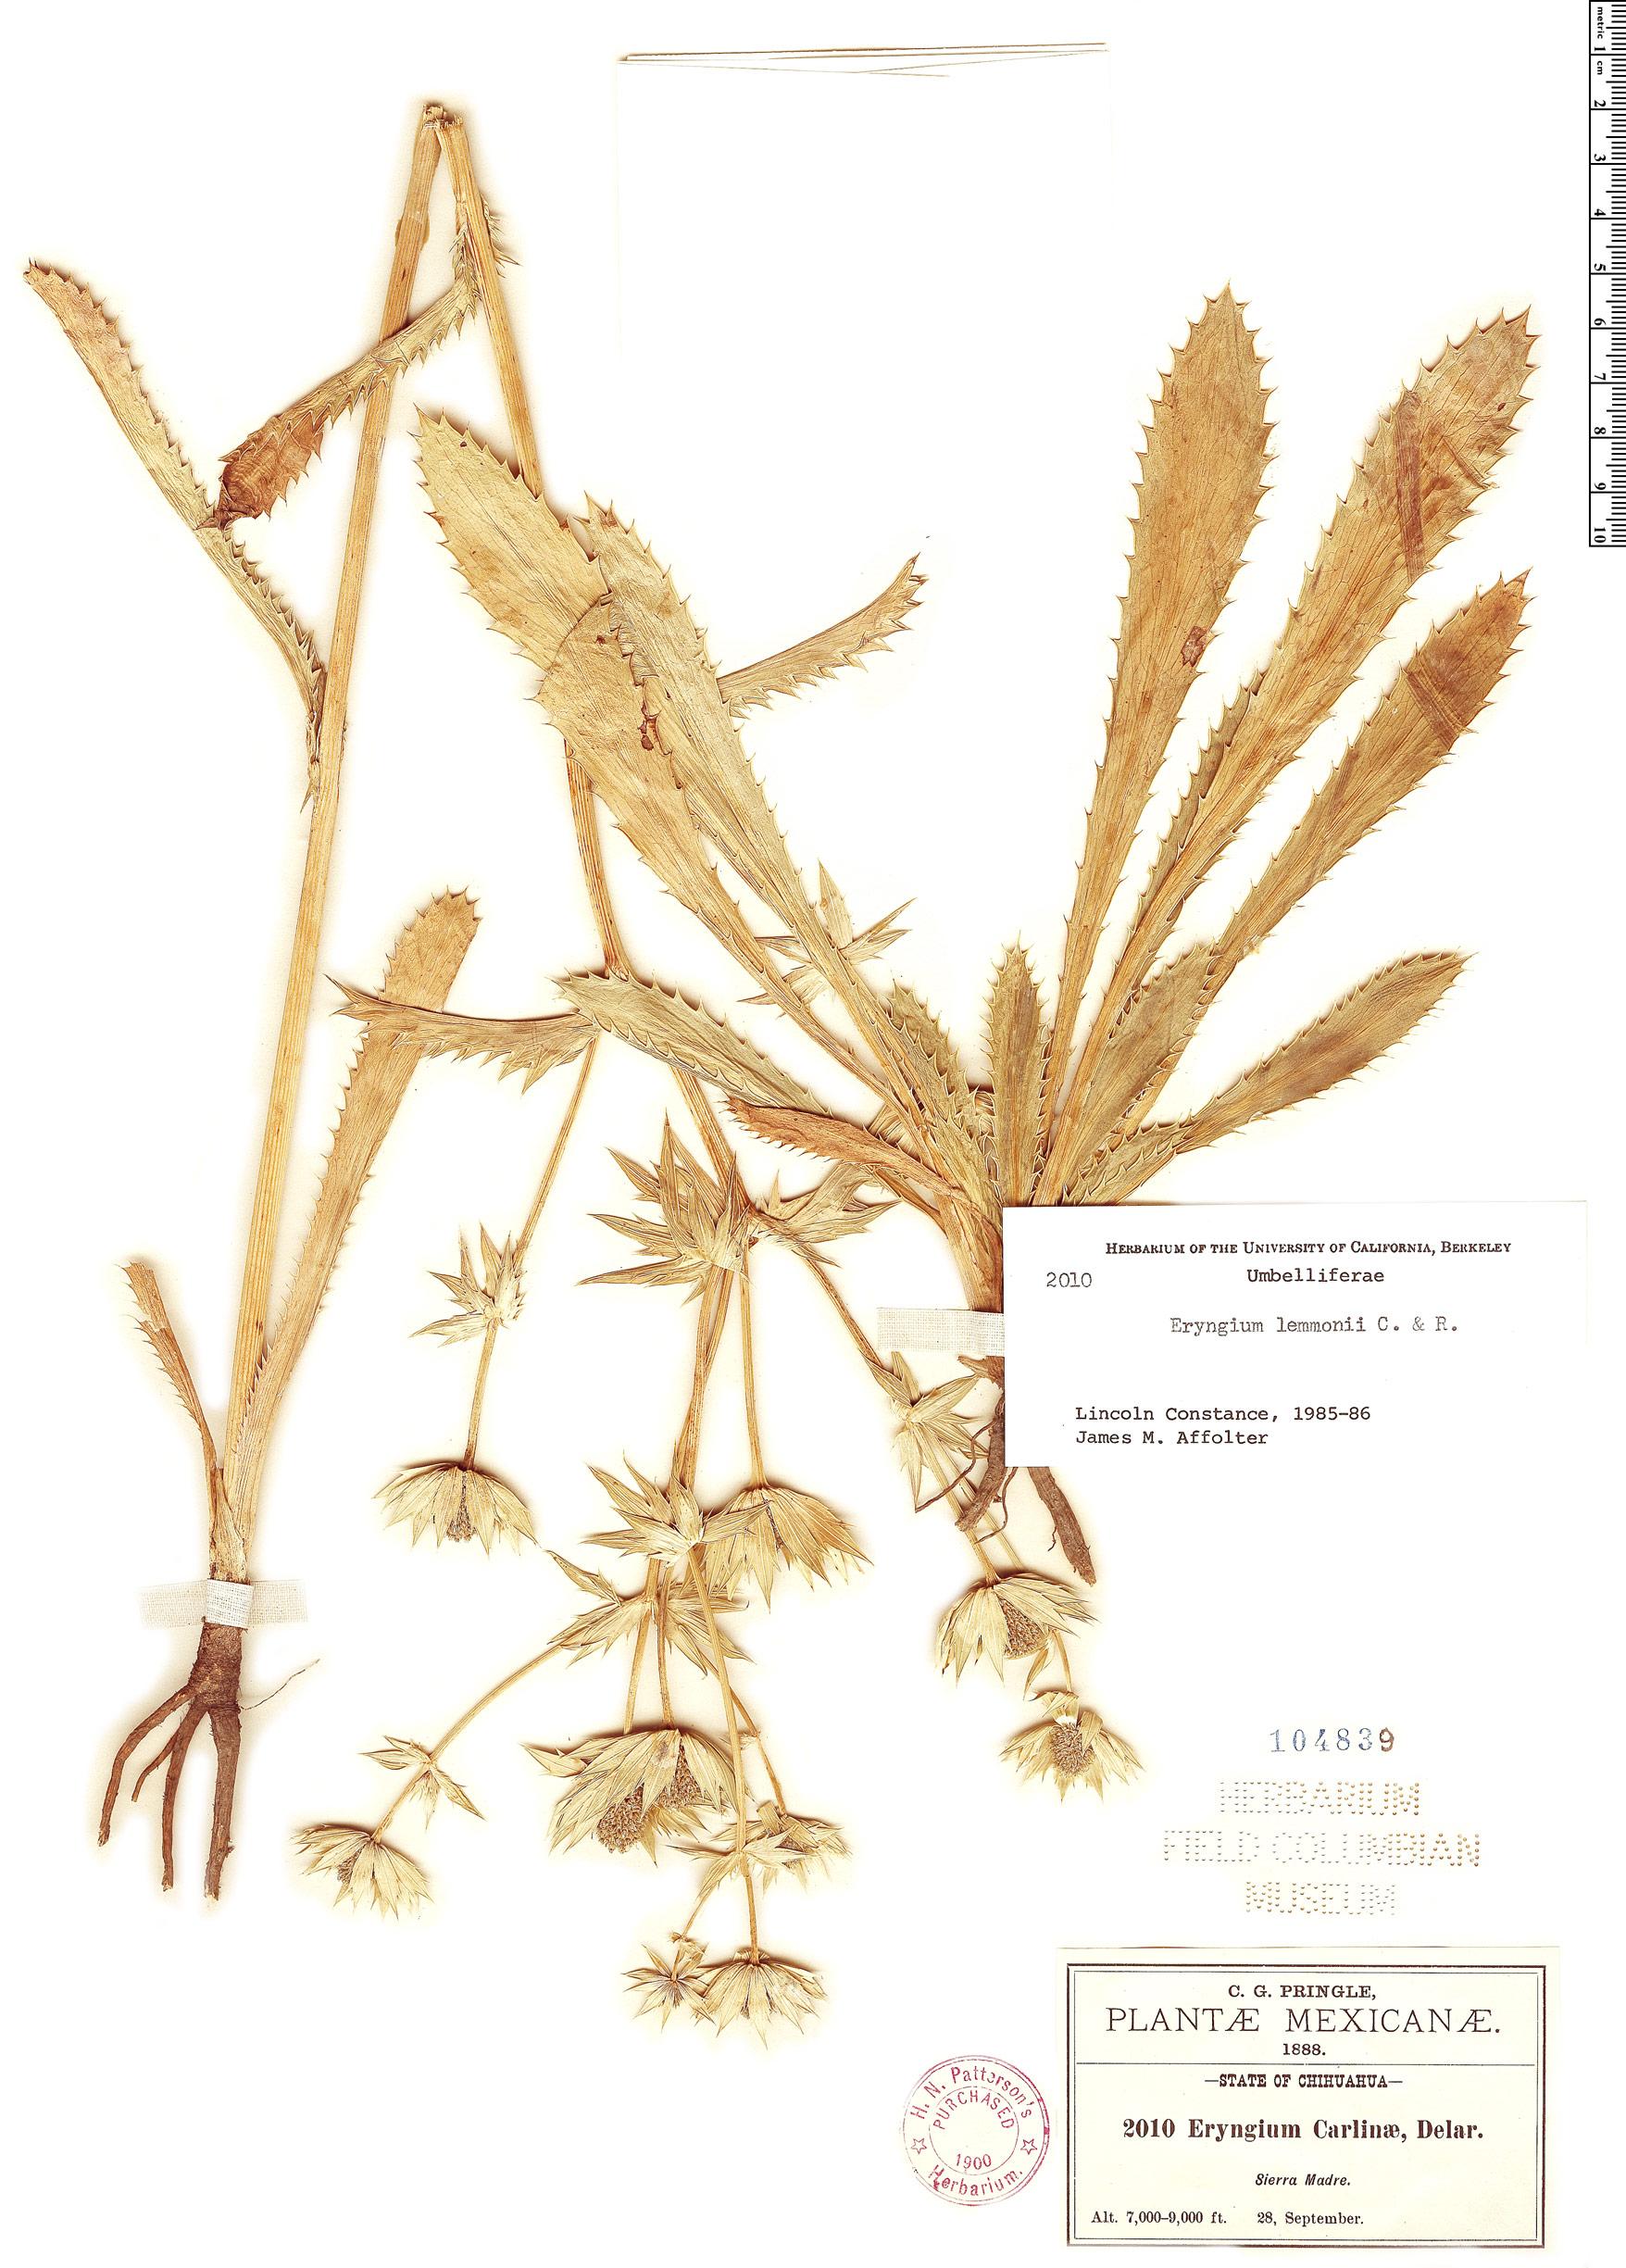 Specimen: Eryngium lemmonii